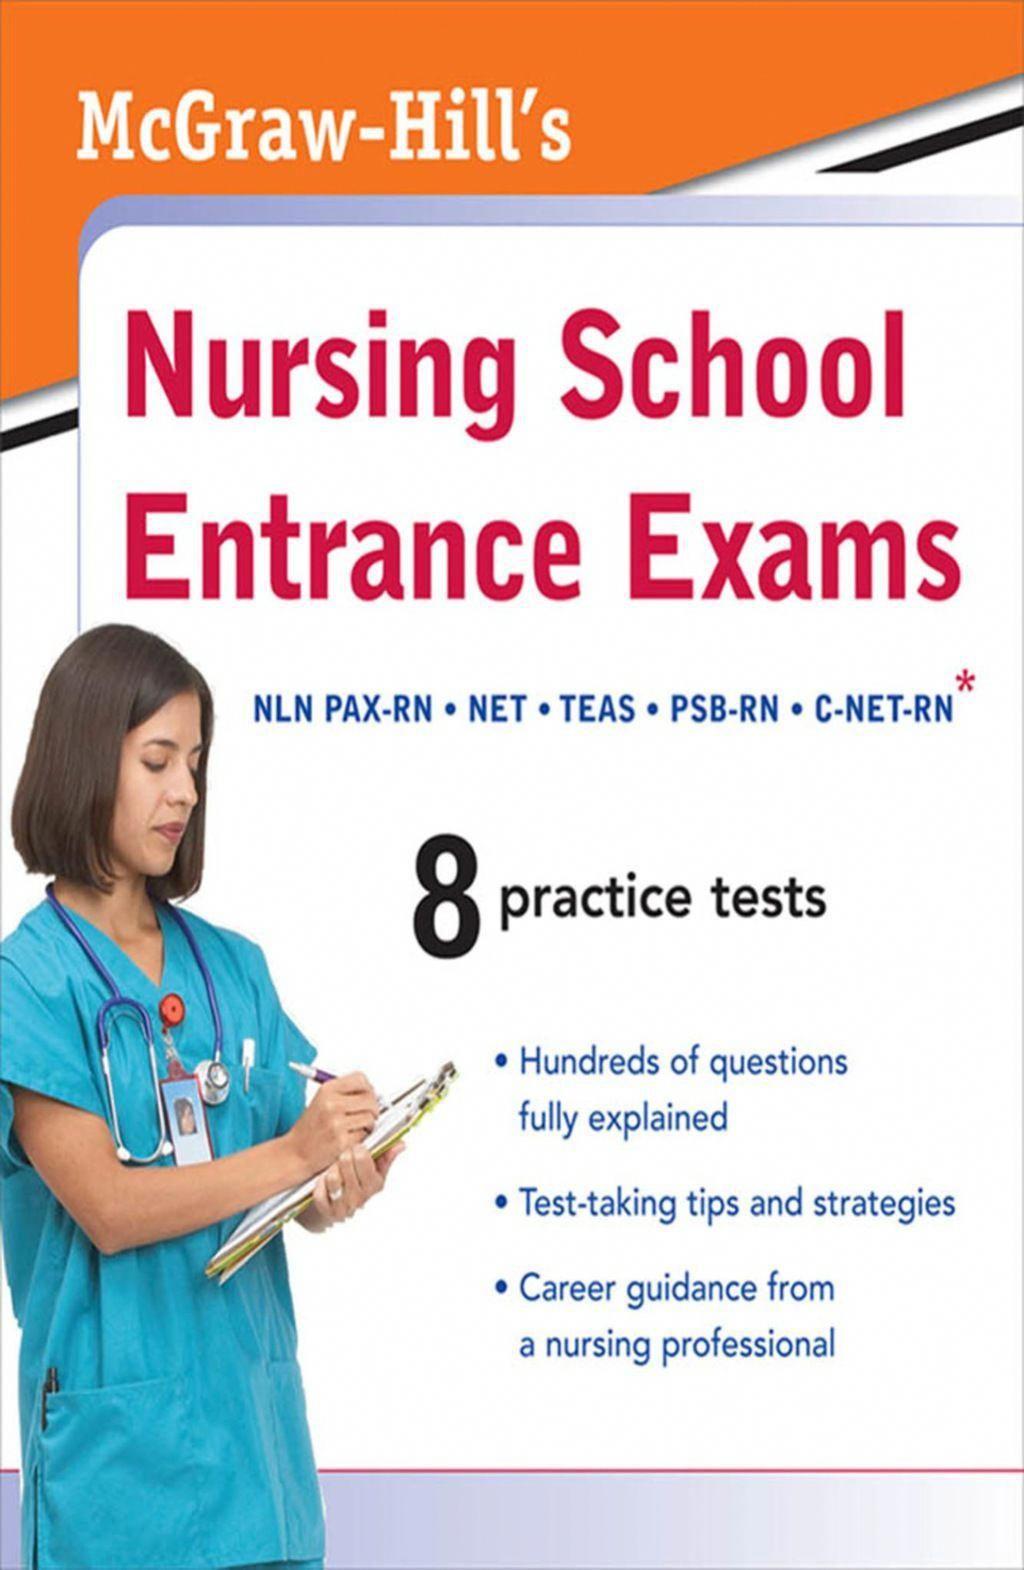 community college nursing programs nursingschoolsinnc